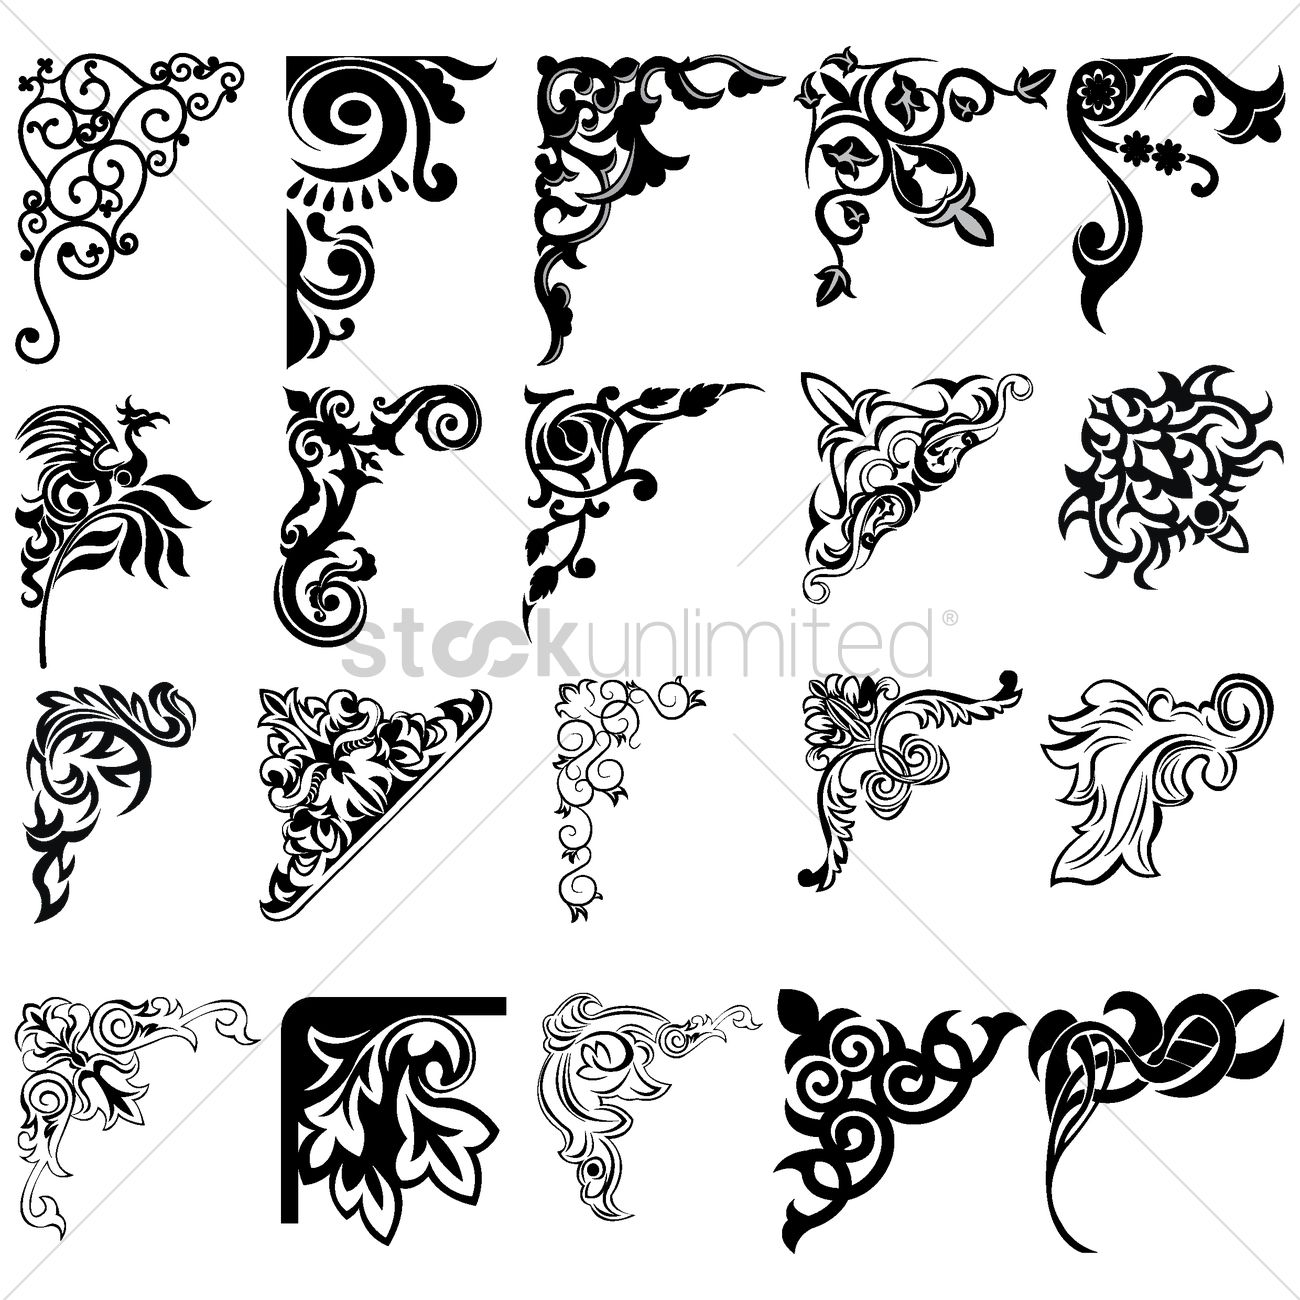 corner element designs vector image 1515567 stockunlimited